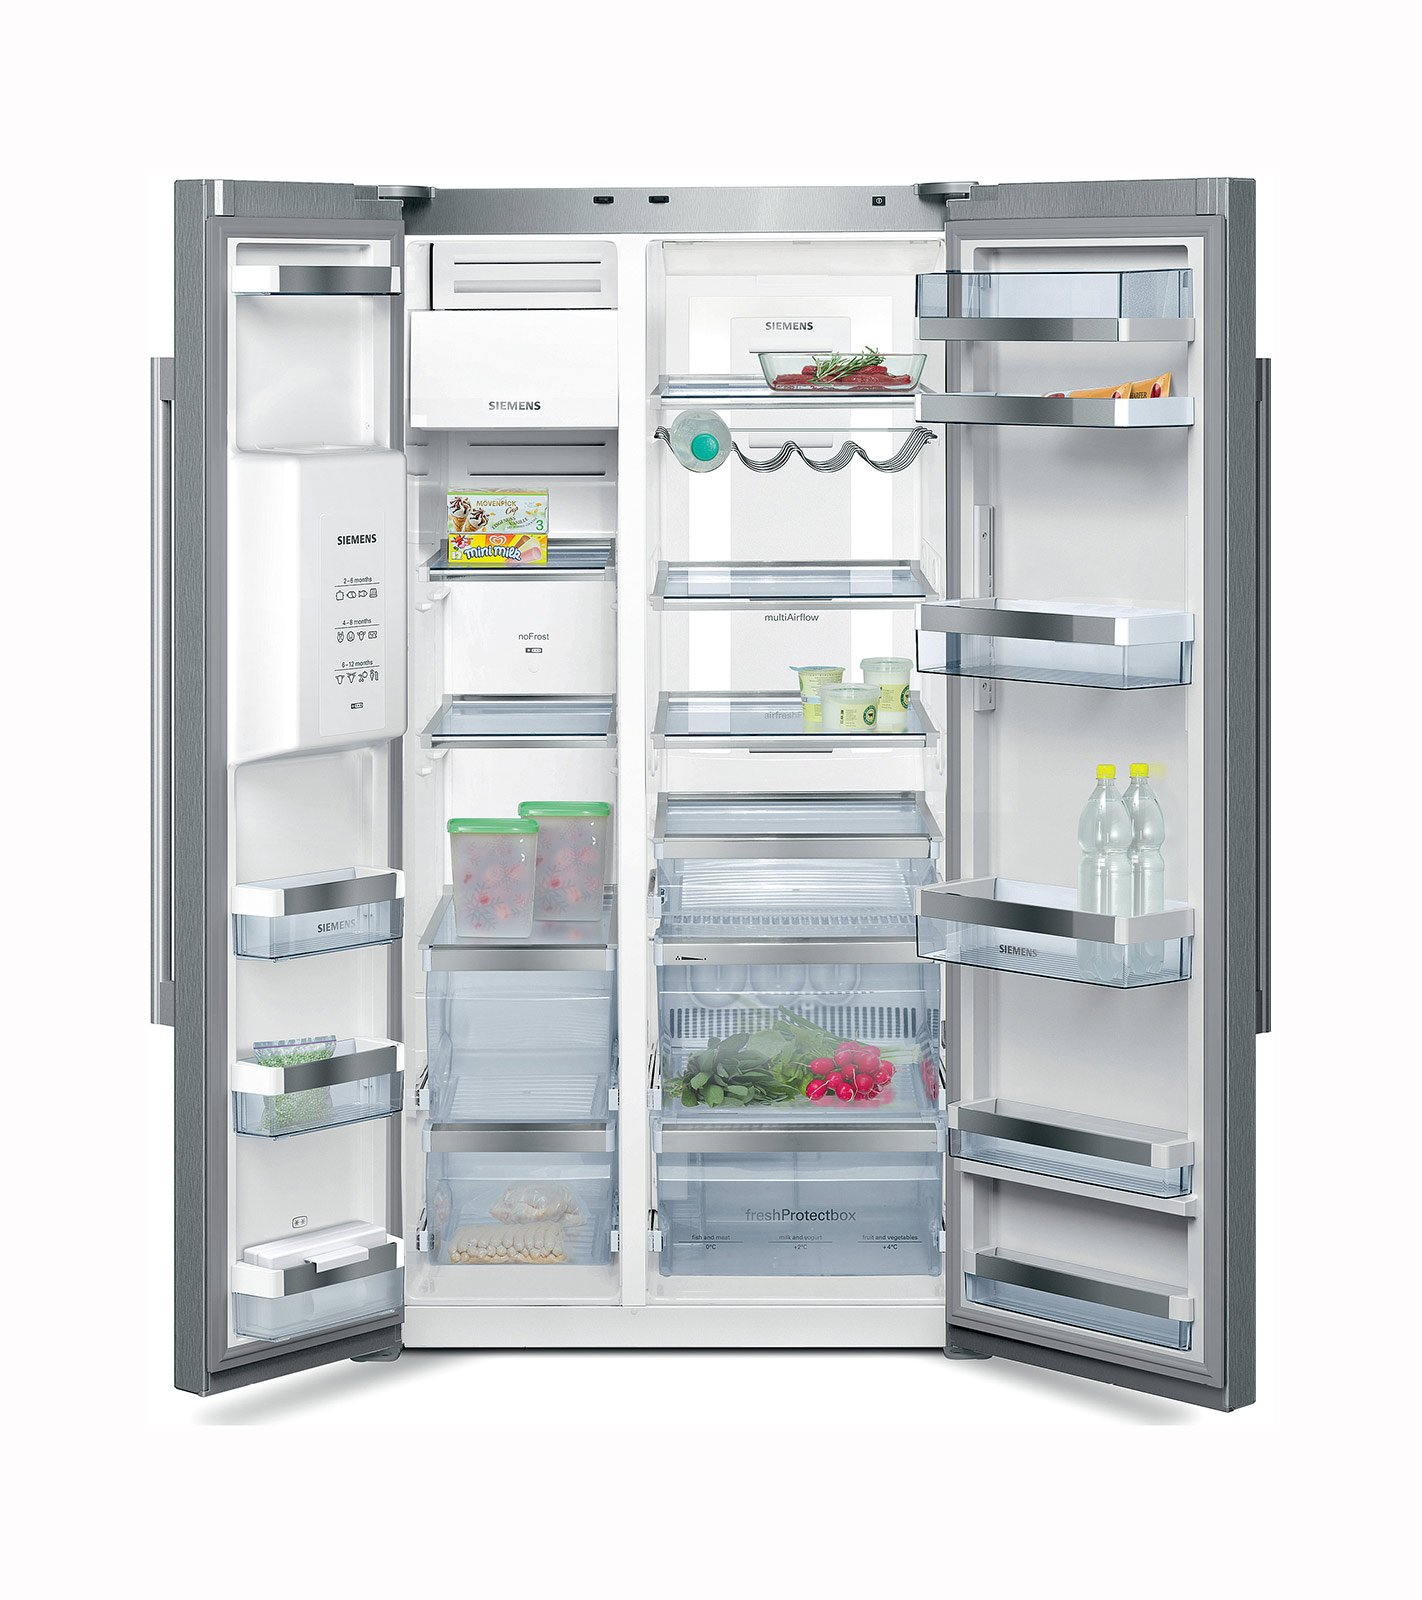 Frigo e congelatore: modelli maxi, a tre porte, side by side ...